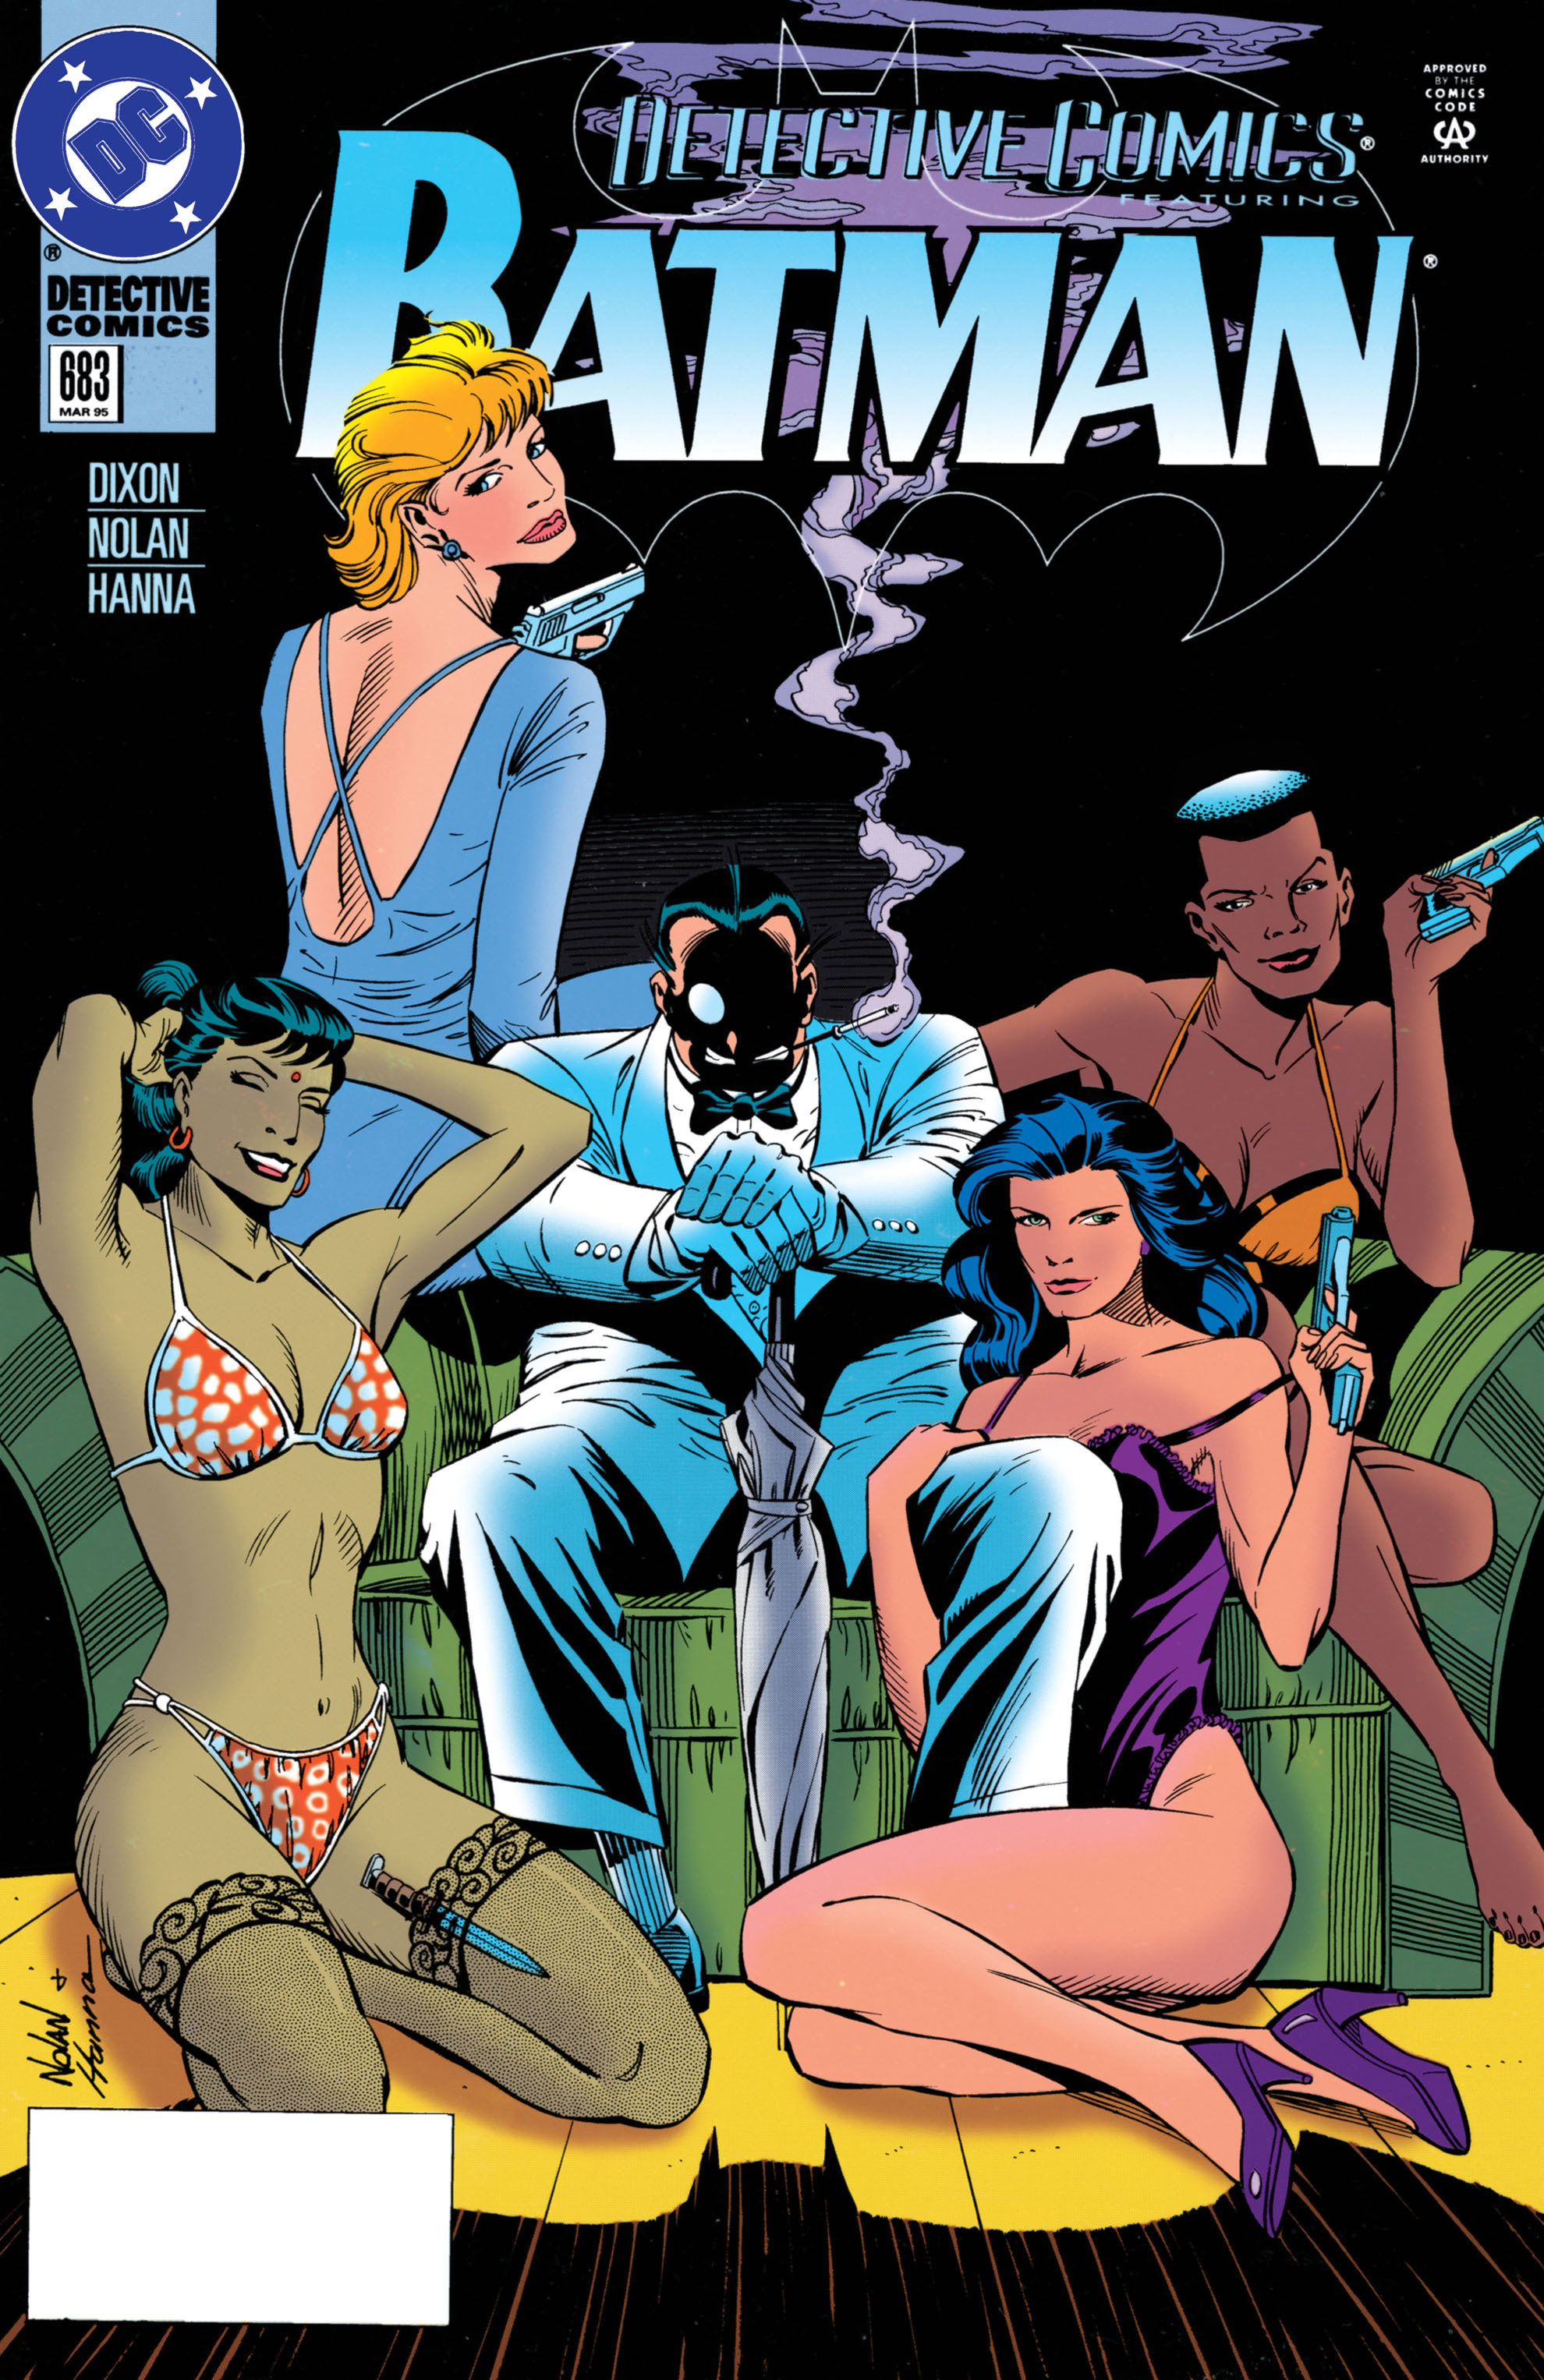 Detective Comics (1937) 683 Page 0